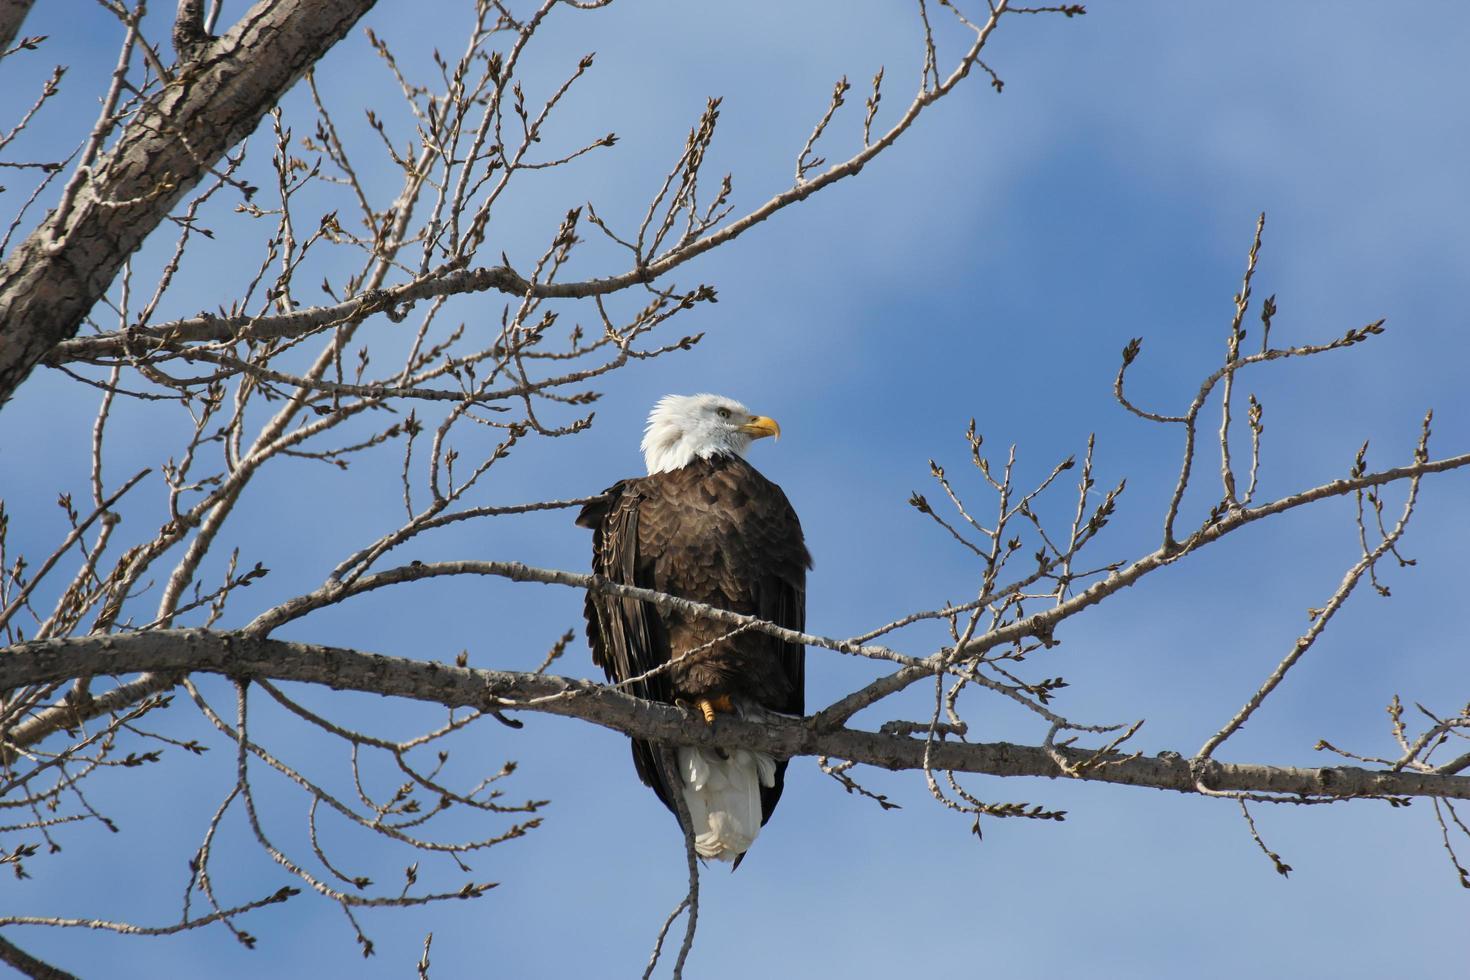 Bald eagle perched on a tree photo